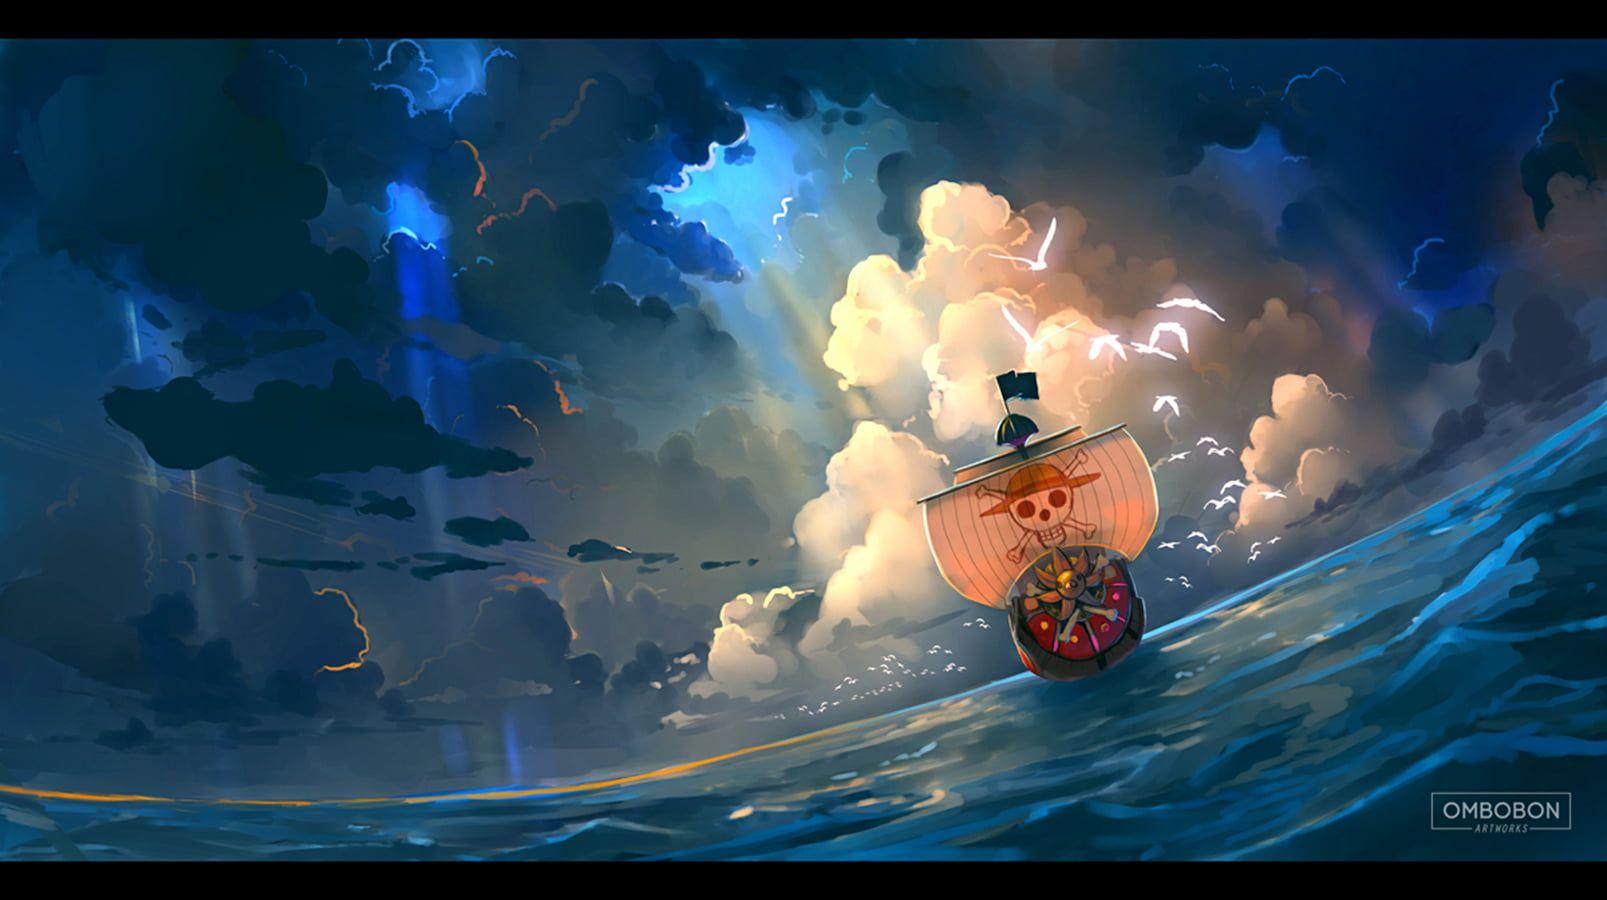 Pin By Luis Santiago Castillo Marcano On One Piece Anime Wallpaper Anime Wallpaper 1920x1080 One Piece Anime